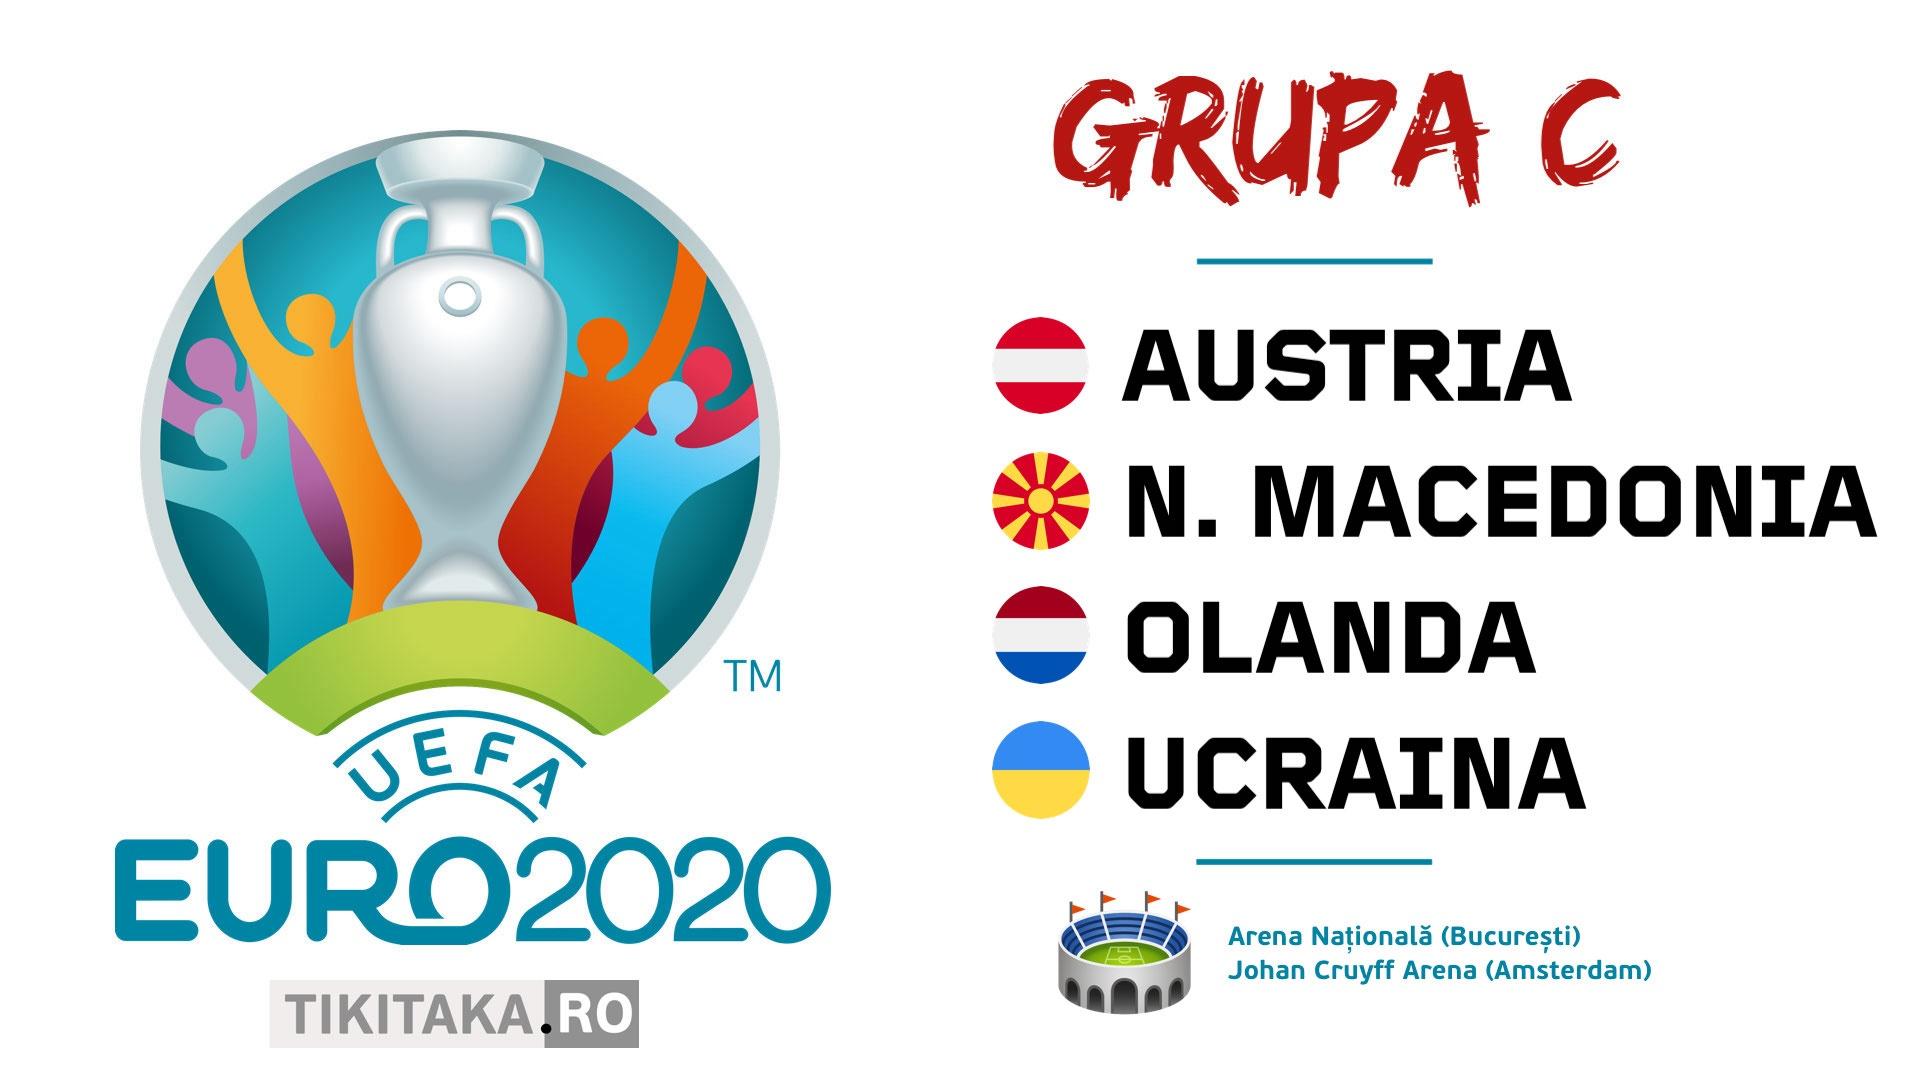 EURO2020 - GRUPA C